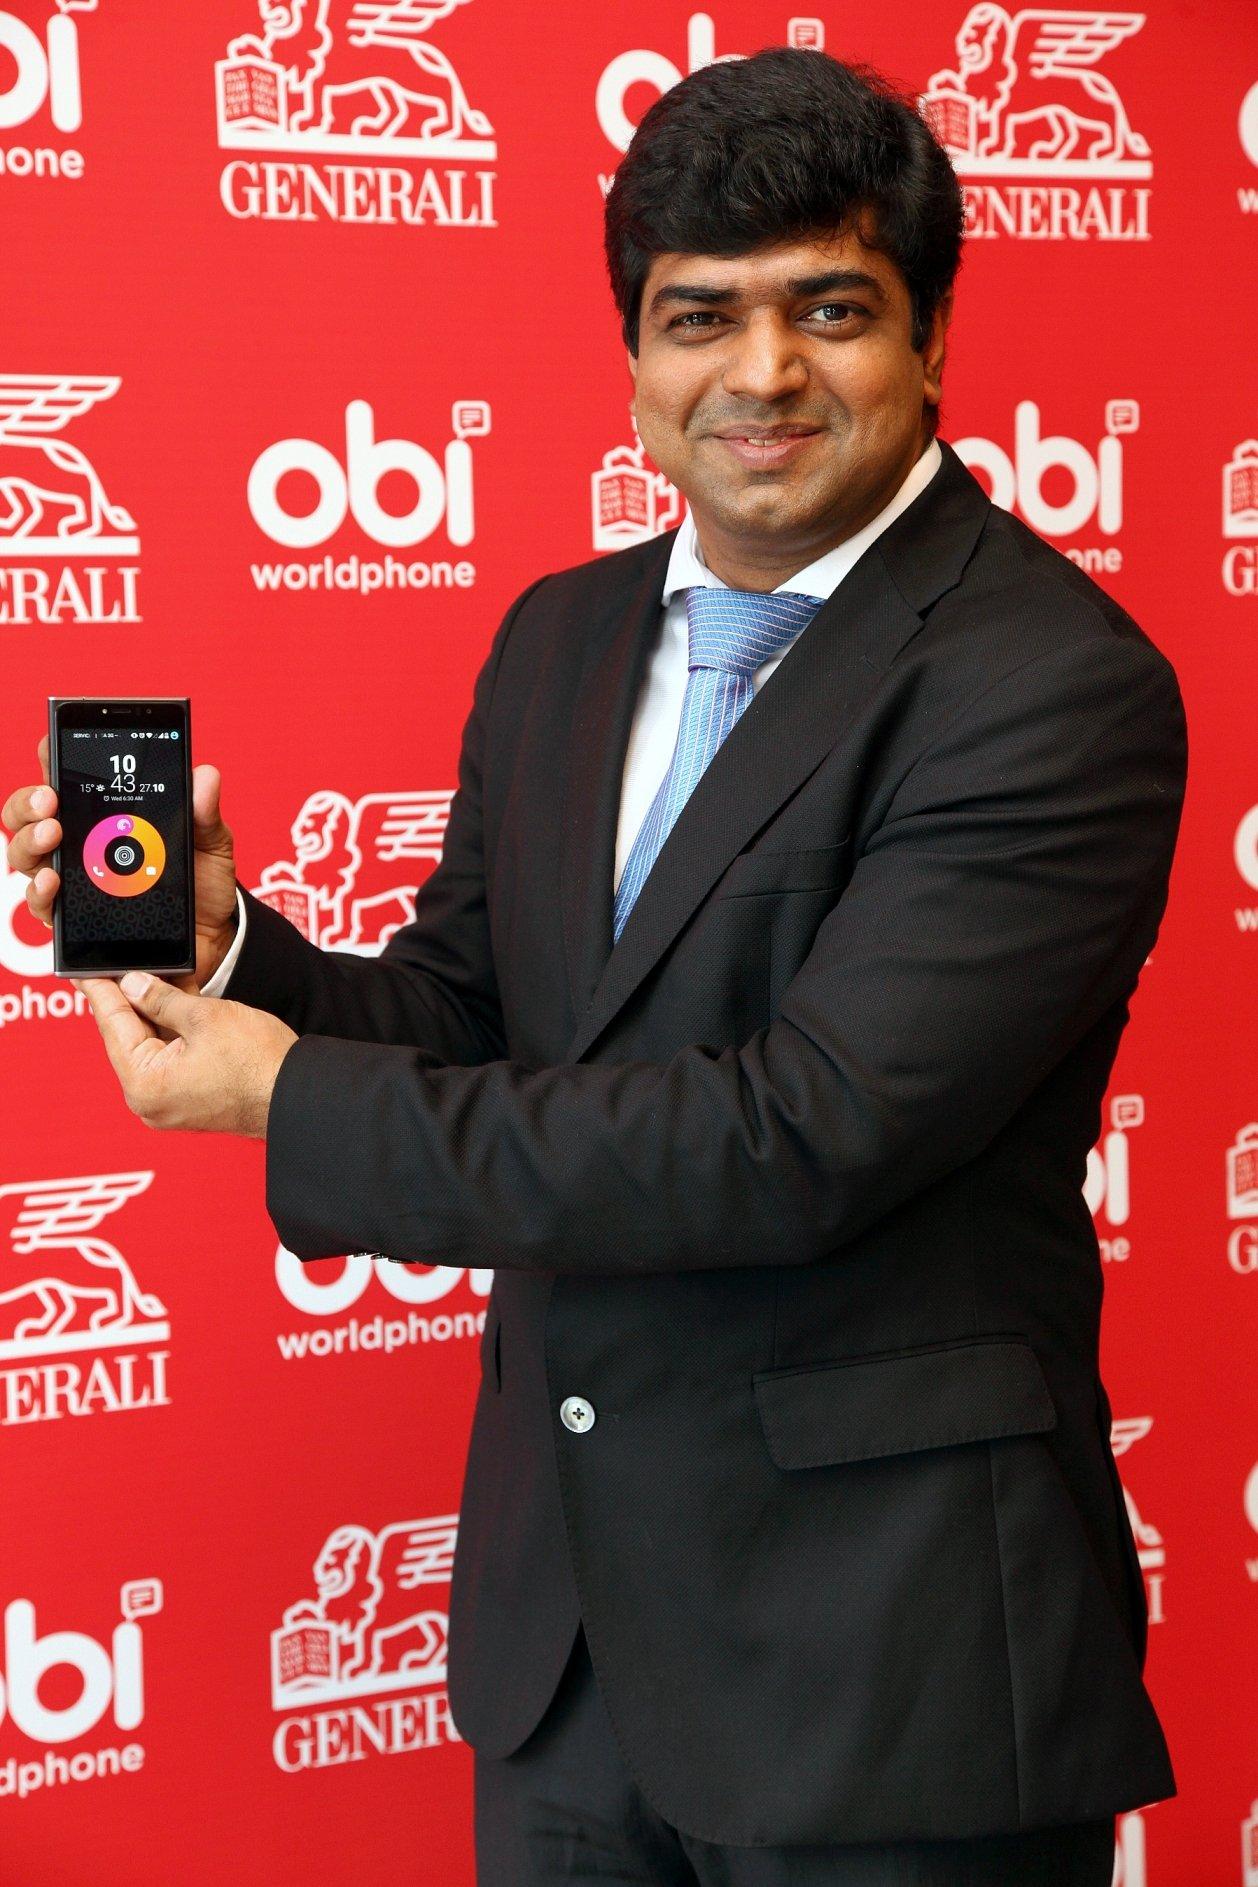 Obi Worldphone EMEA Bölge Müdürü Amit Rupchandani